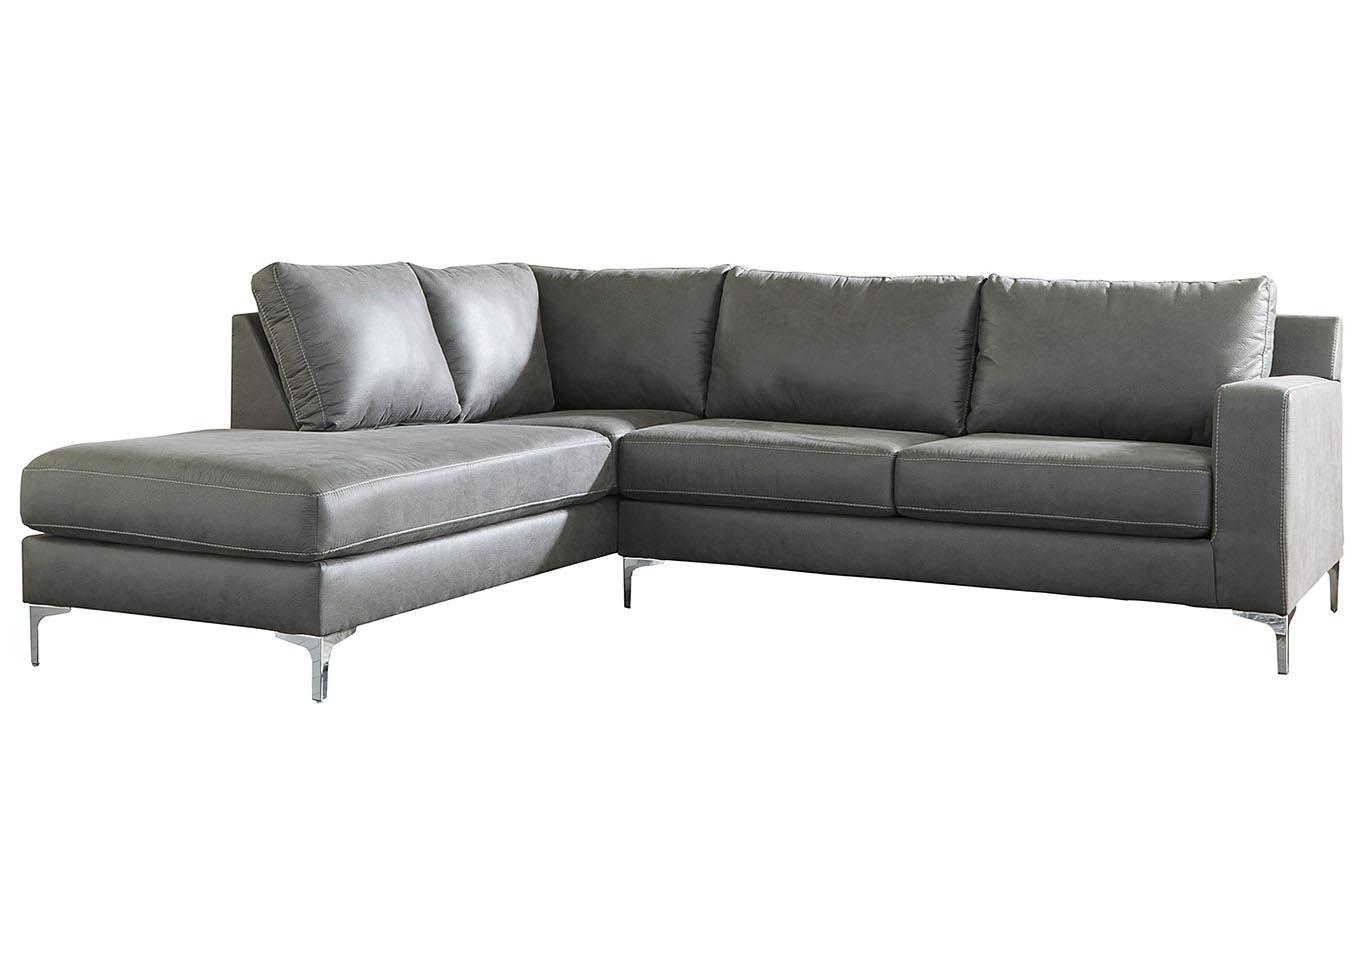 Tremendous Oak Furniture Liquidators Ryler Charcoal Laf Sofa Chaise Machost Co Dining Chair Design Ideas Machostcouk